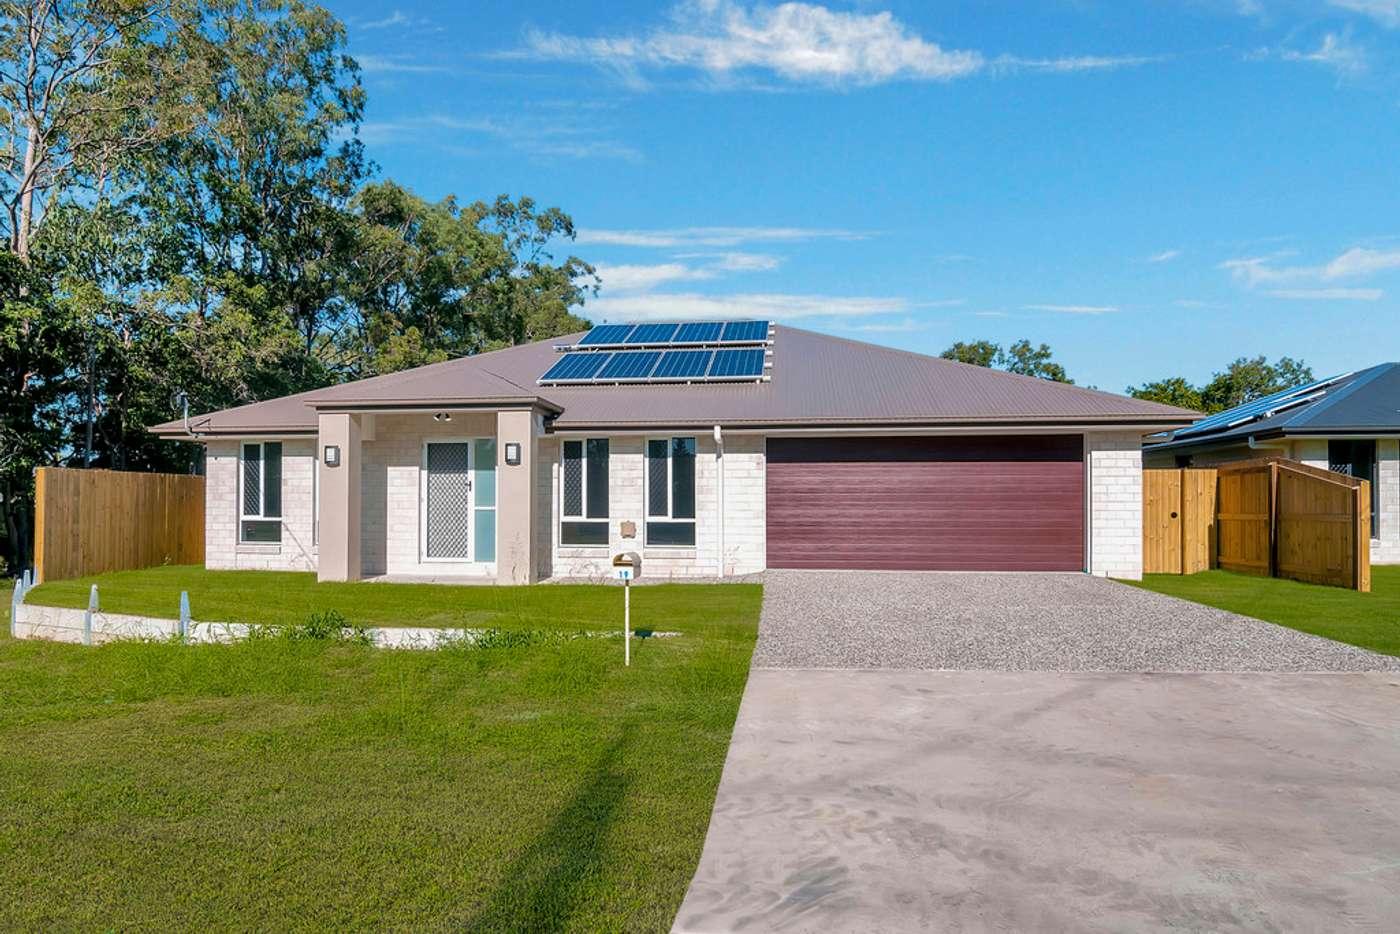 Main view of Homely house listing, 19 Macaranga Street, Marsden QLD 4132